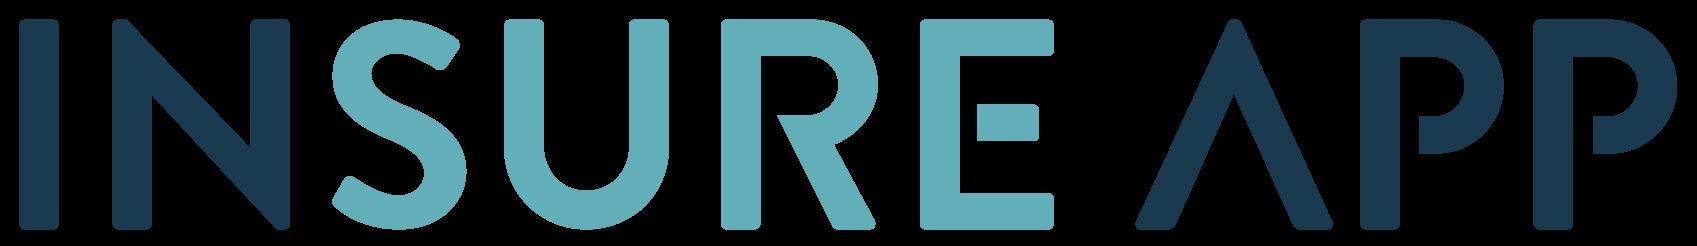 Insure app logo dark